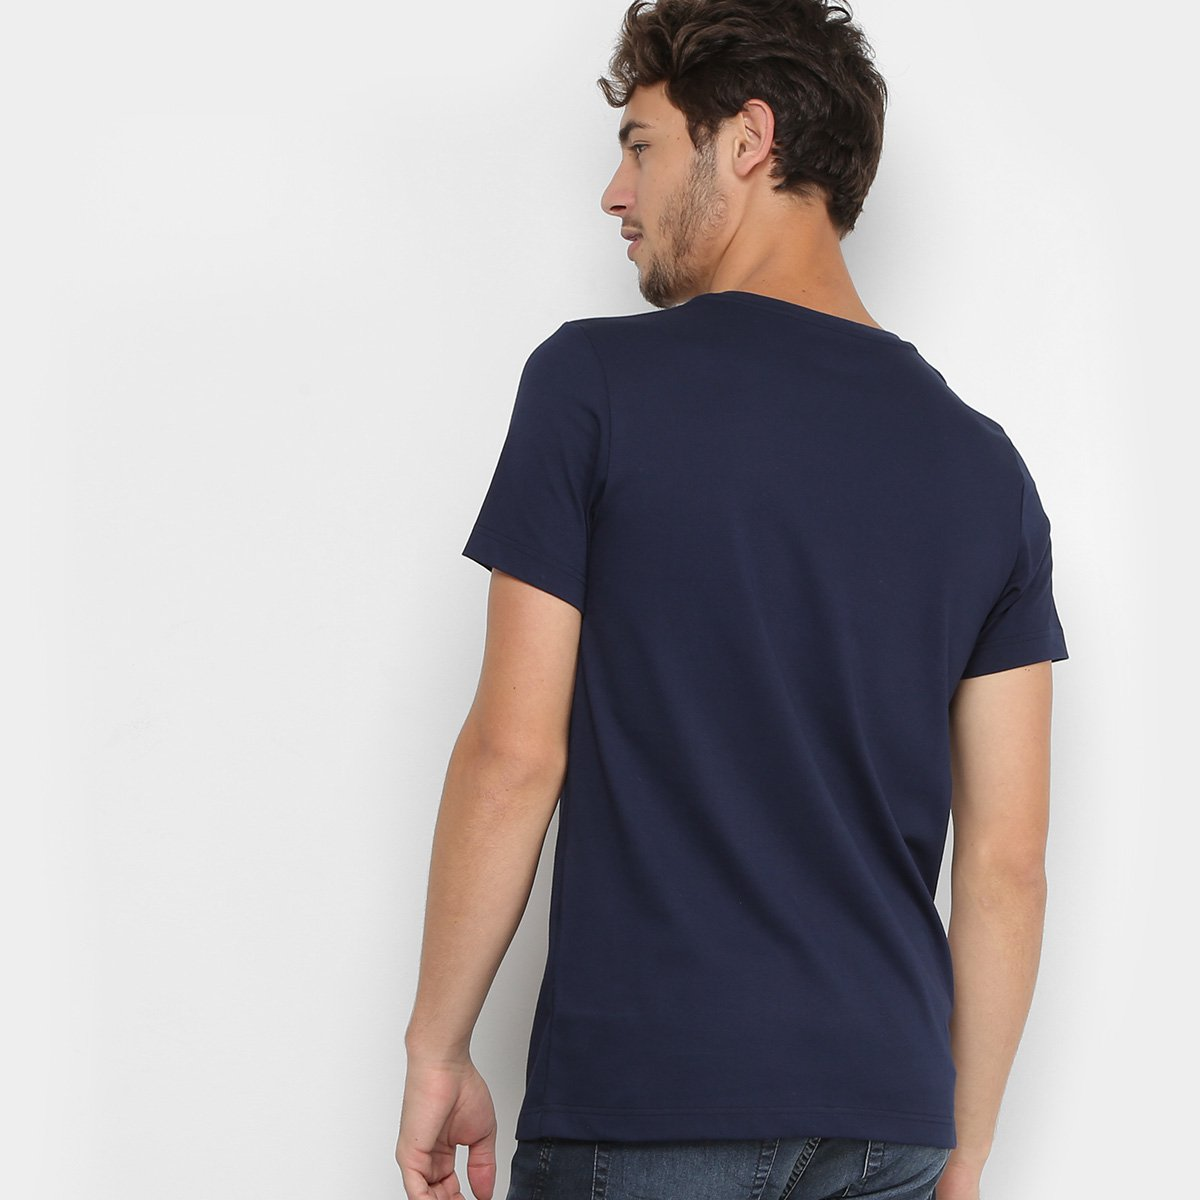 Camiseta Lacoste Sport Tennis Listrada Masculina - Compre Agora ... 388be71859aad